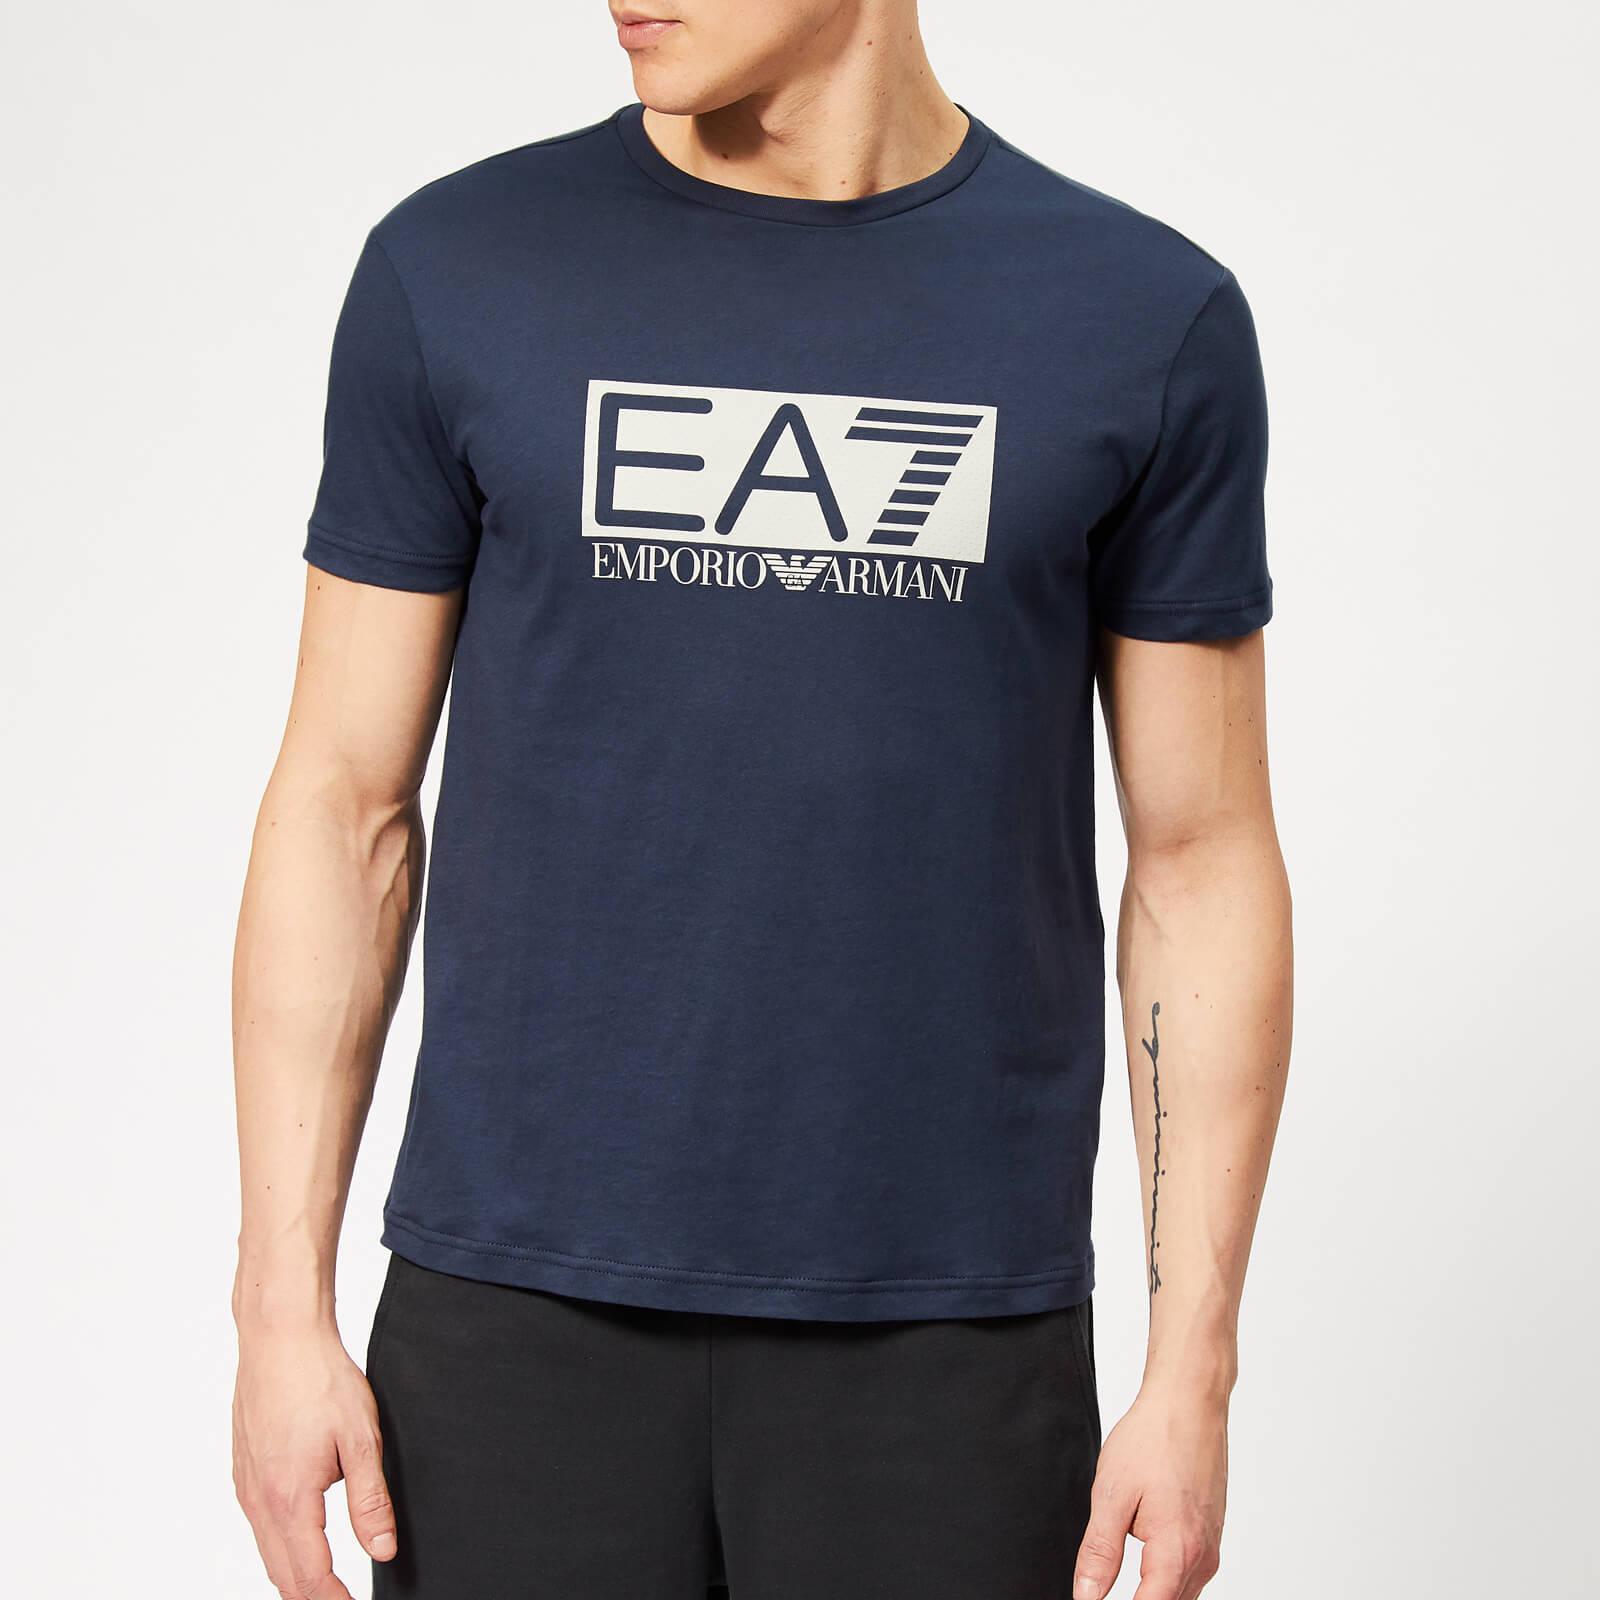 936018a3 Emporio Armani EA7 Men's Train Visibility Short Sleeve T-Shirt - Blue  Clothing | TheHut.com